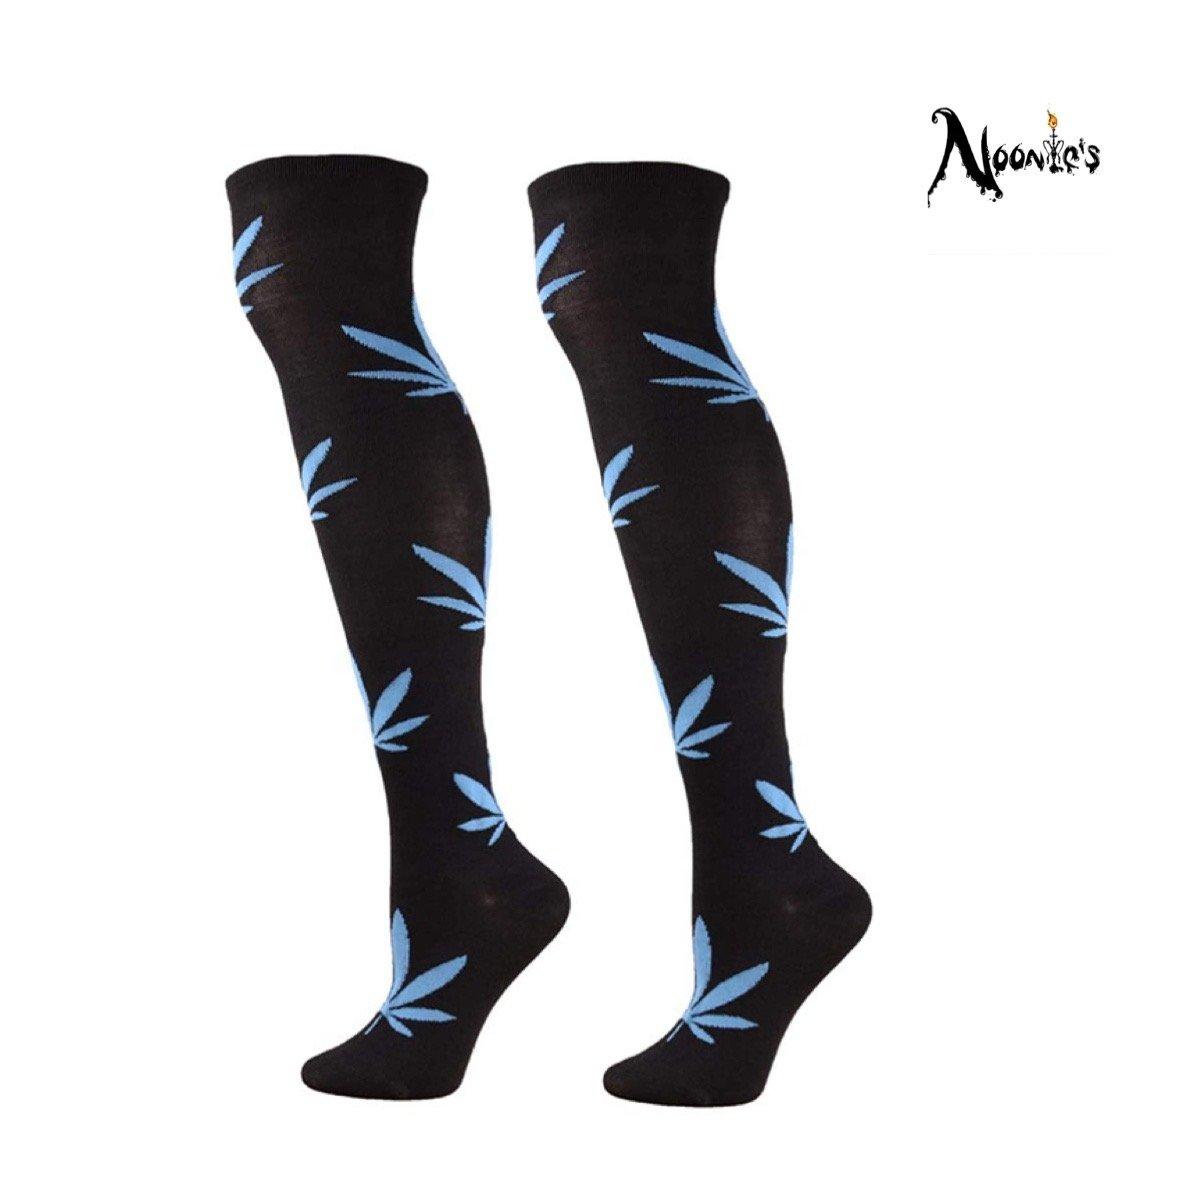 Image of Knee High High Socks